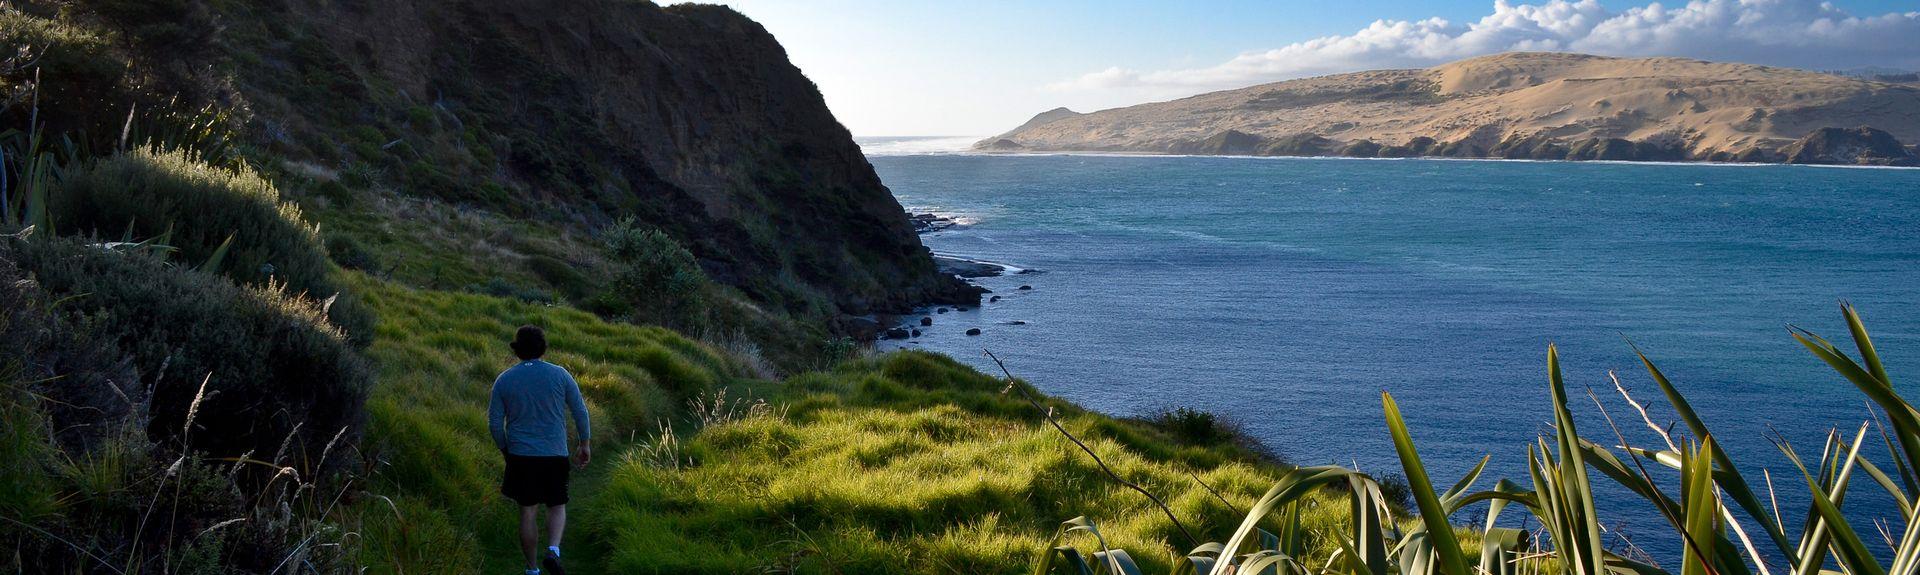 Northland, Nova Zelândia